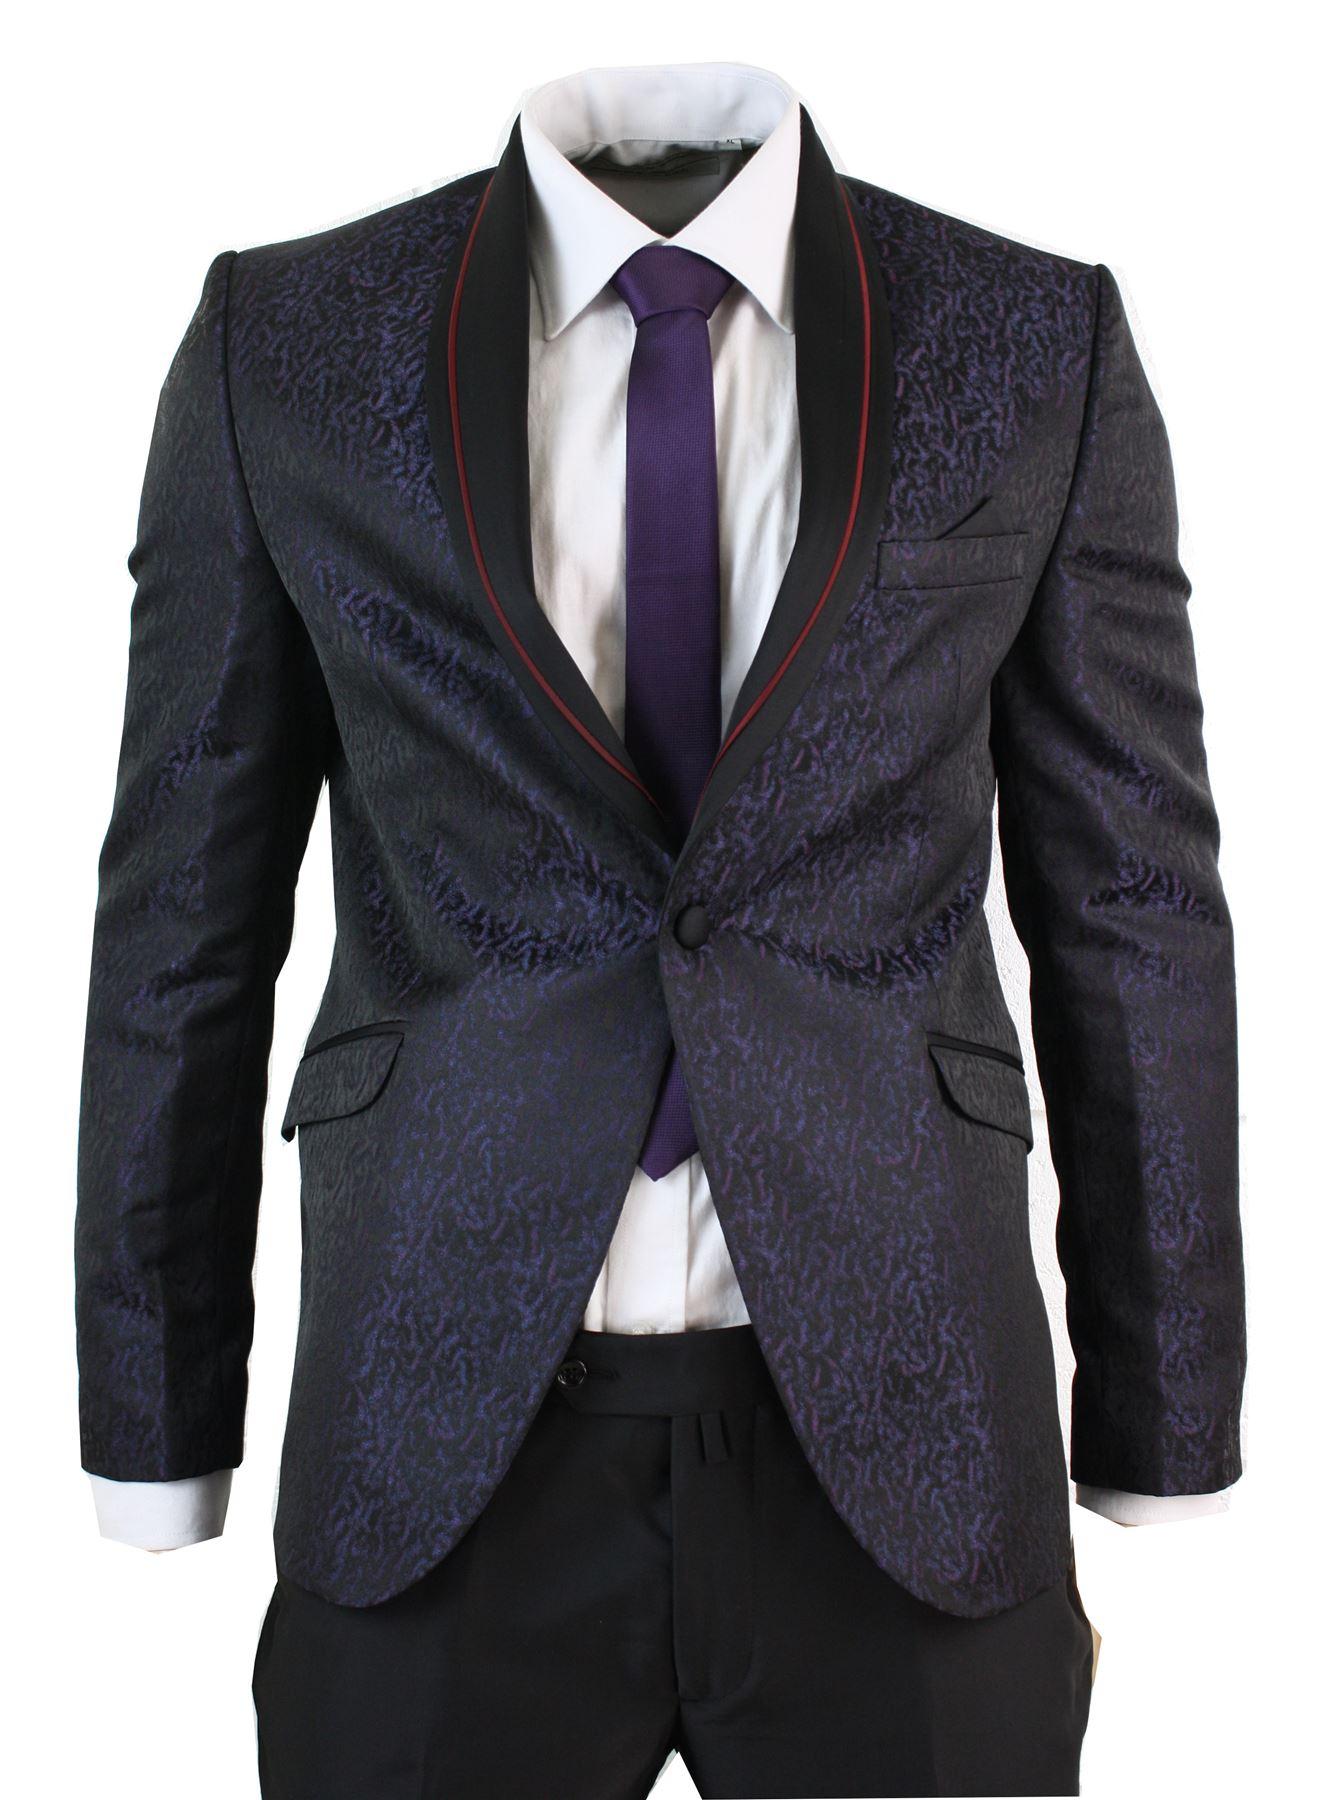 costume homme smoking noir bordeaux violet veste et. Black Bedroom Furniture Sets. Home Design Ideas